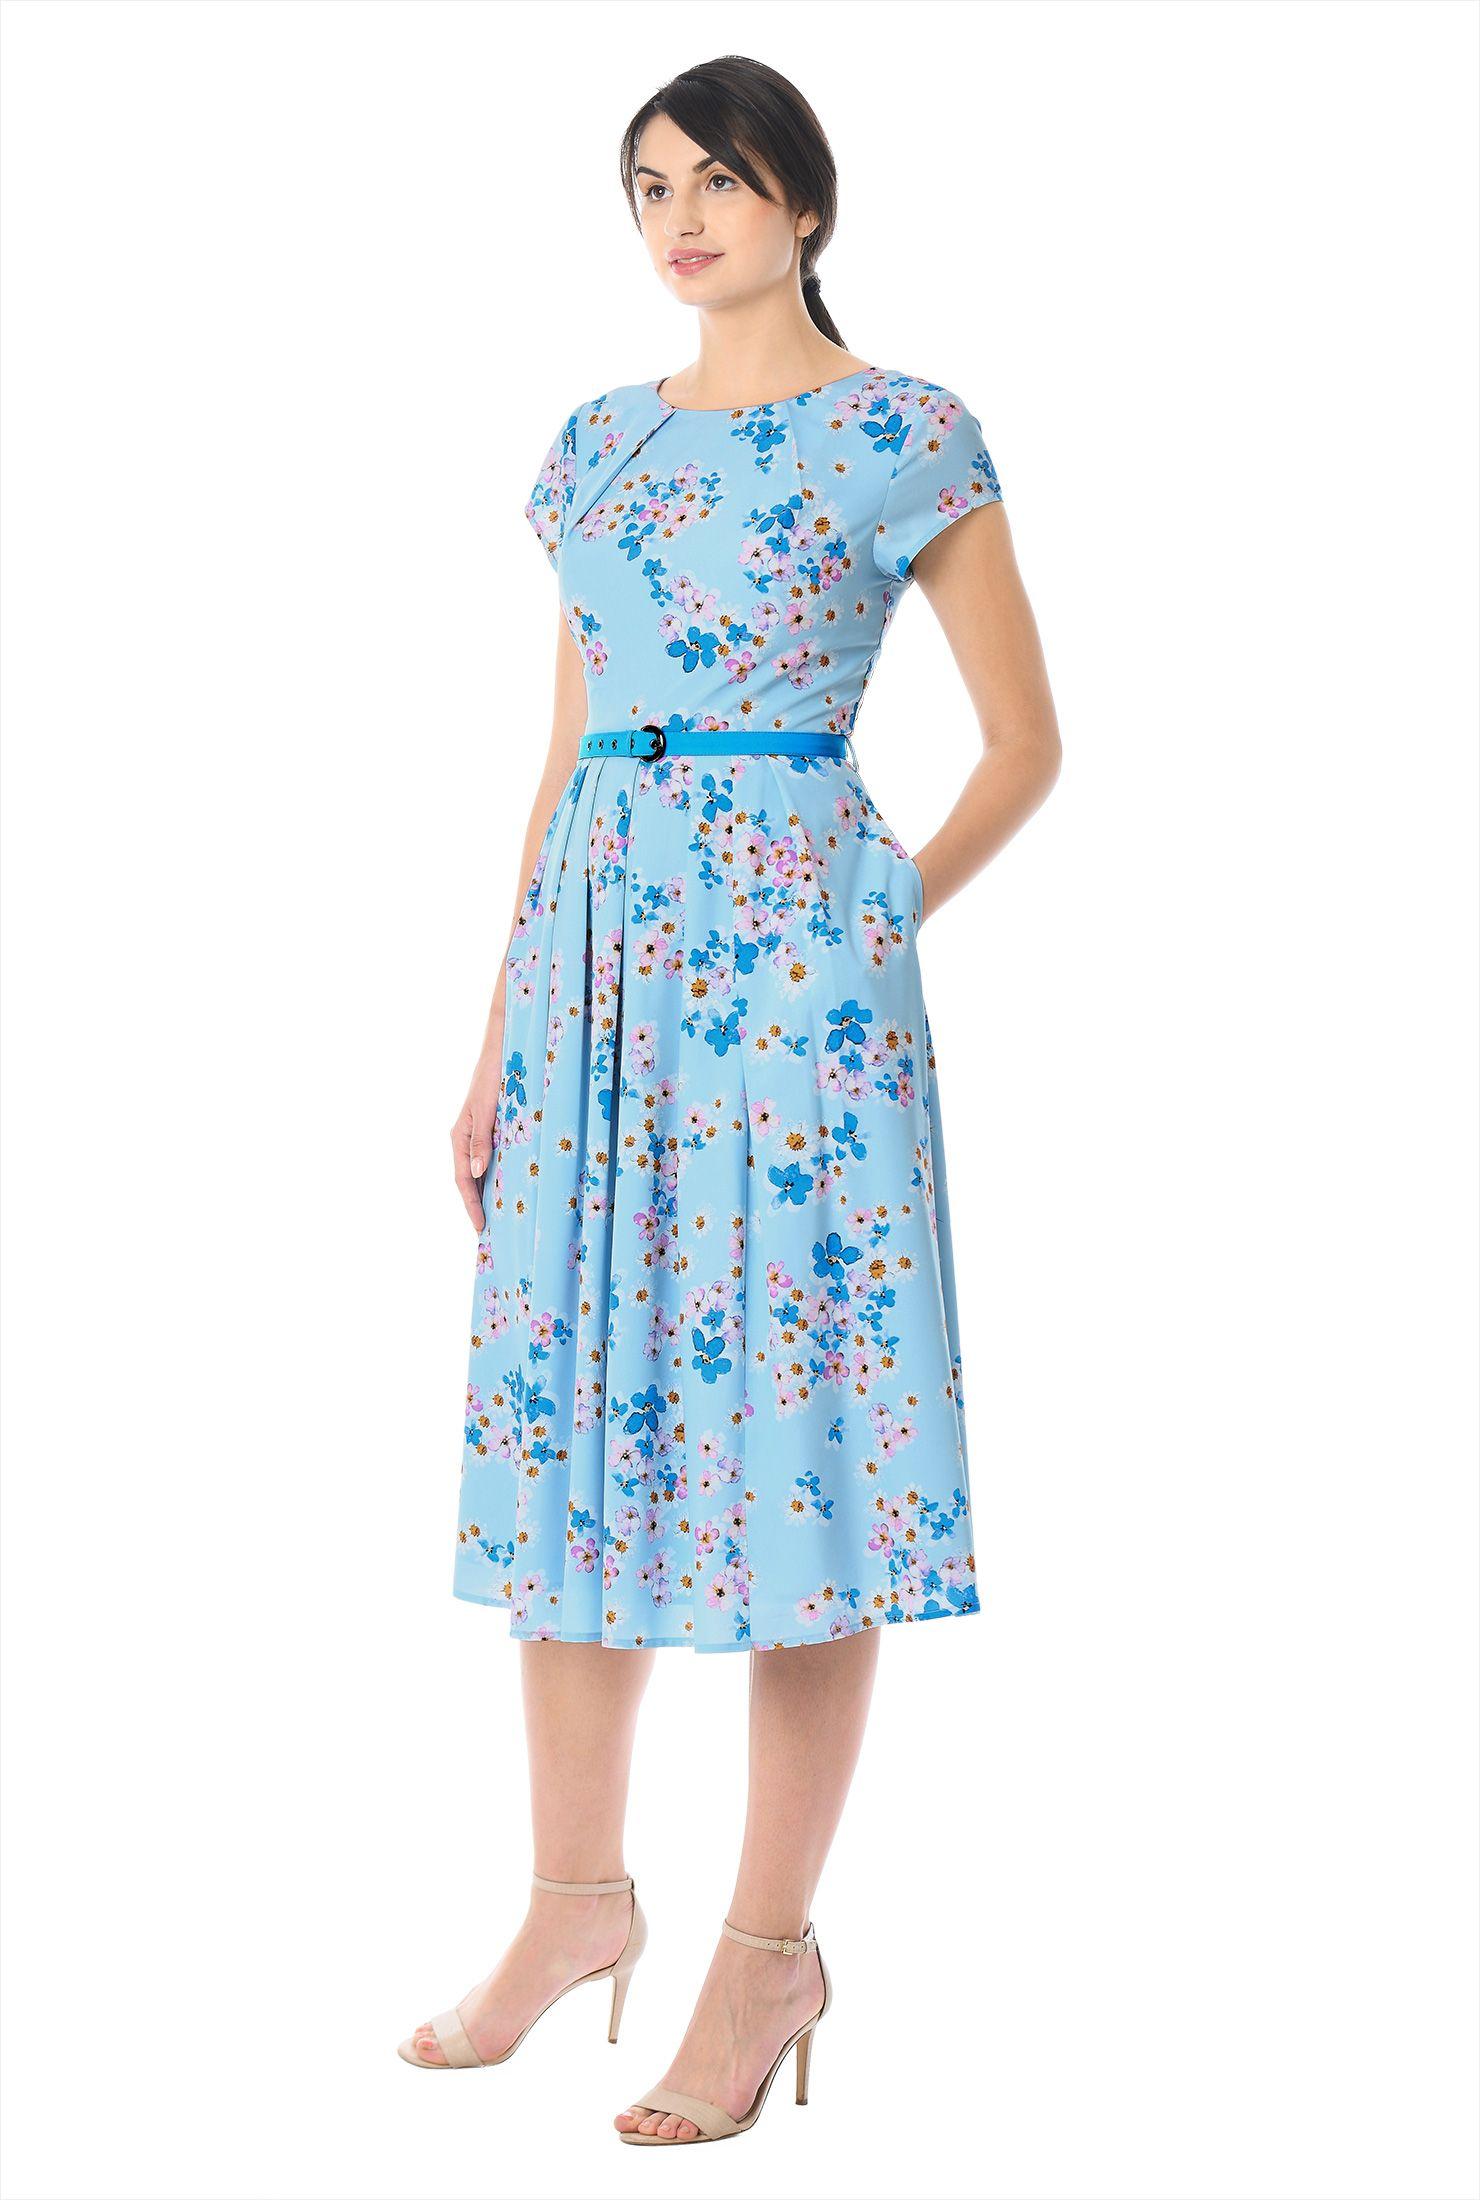 Cap Sleeves Floral Print Dresses Lightweight Dresses Machine Wash